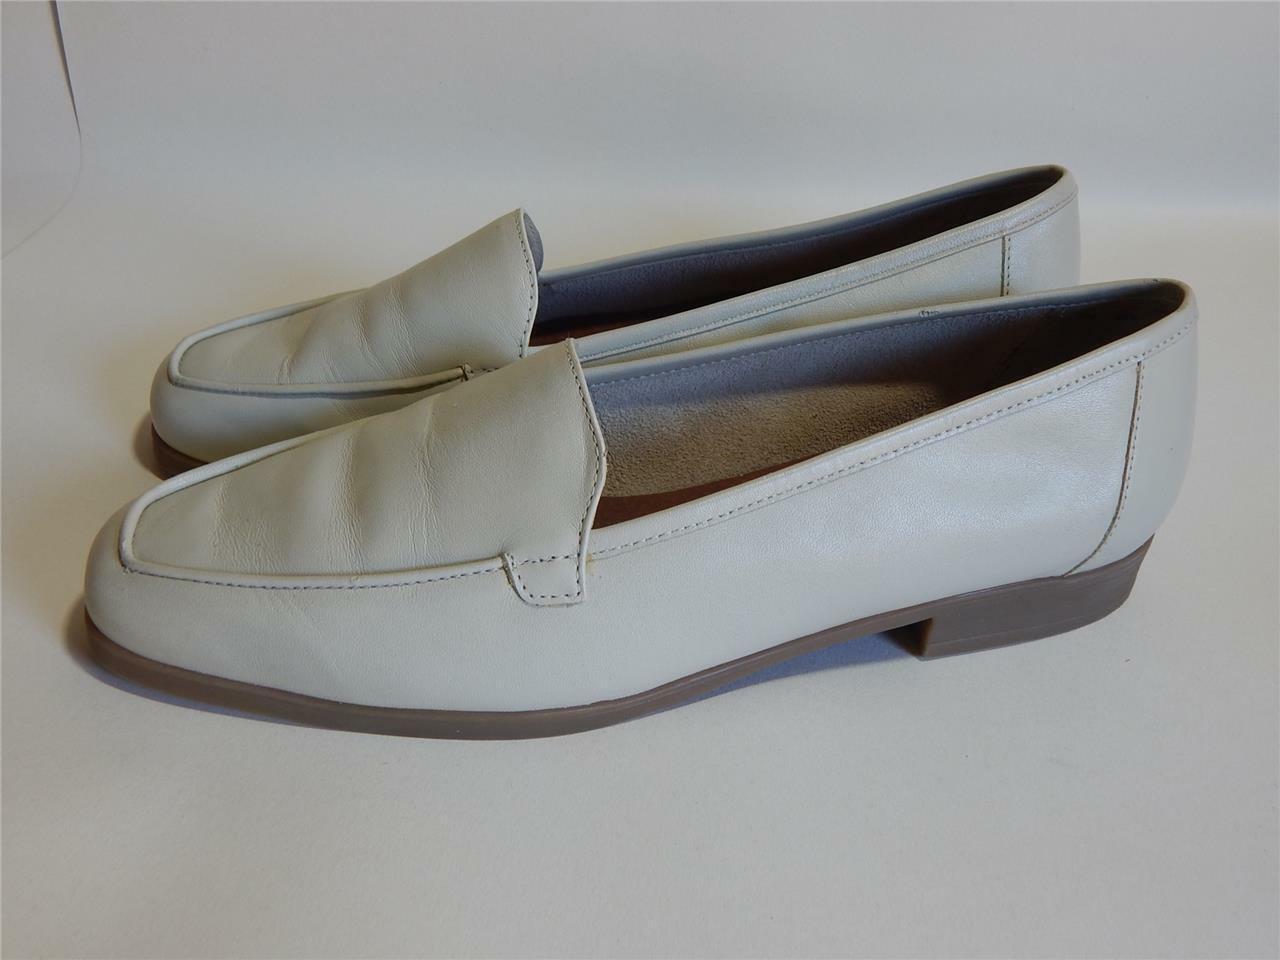 Clarks beige comfort soft leather Ladies Shoes Size 7.5 UK